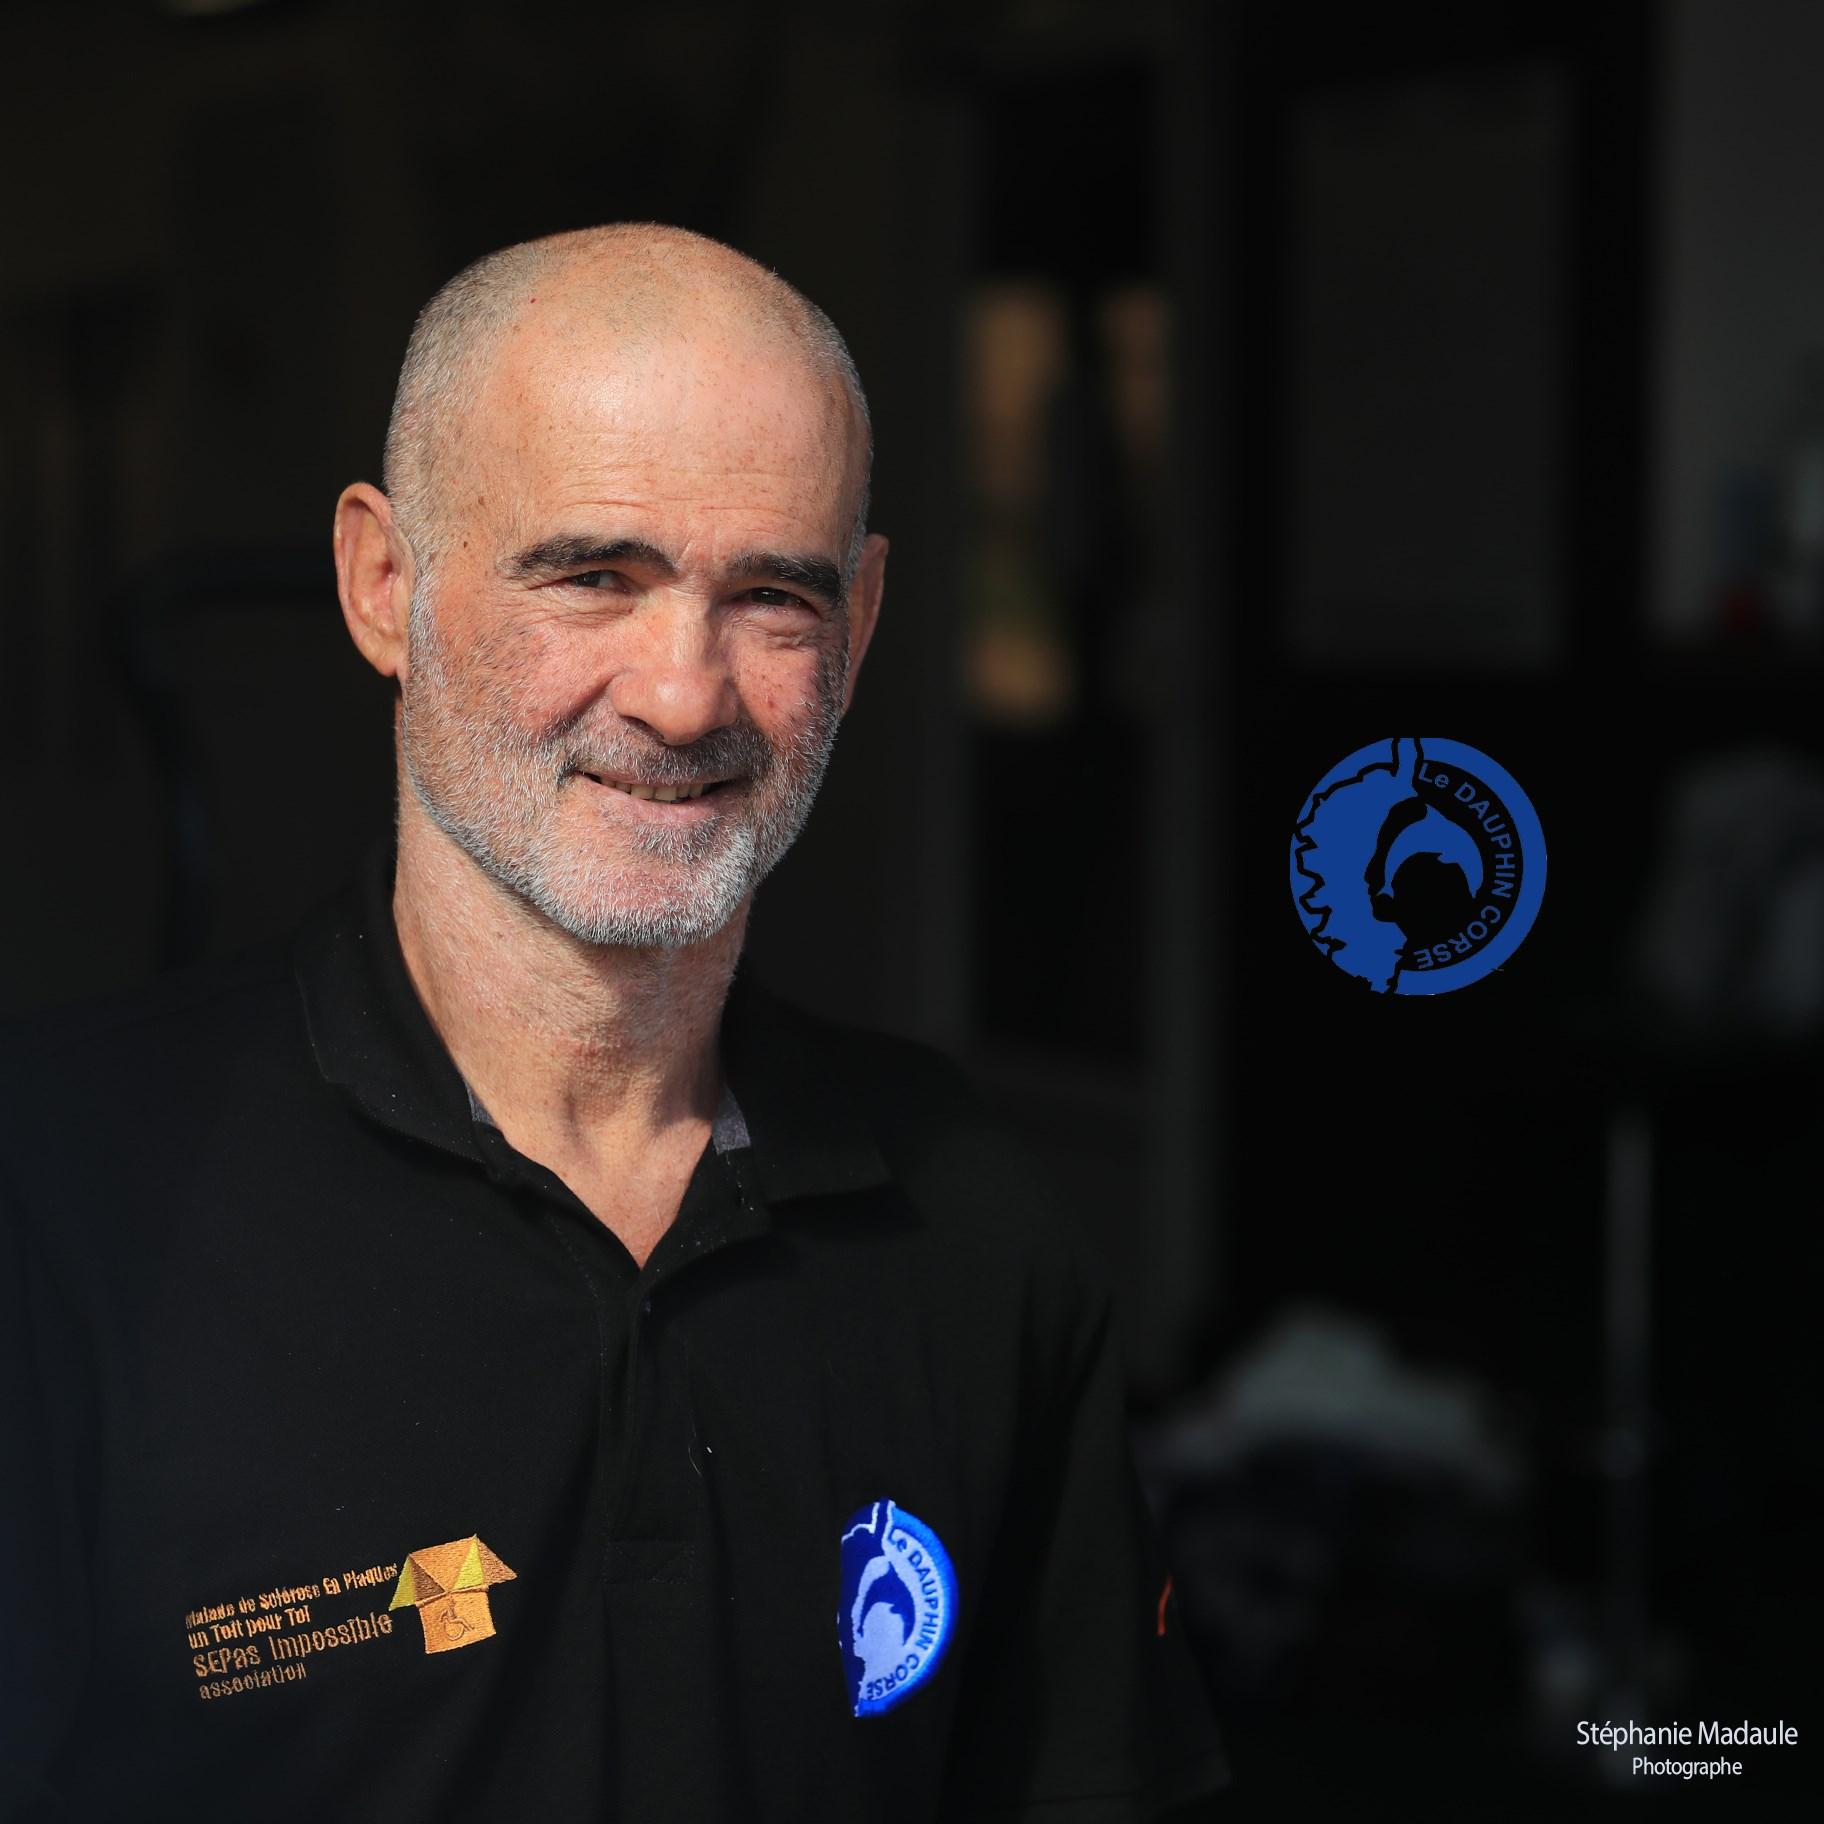 Portrait Thierry Corbalan